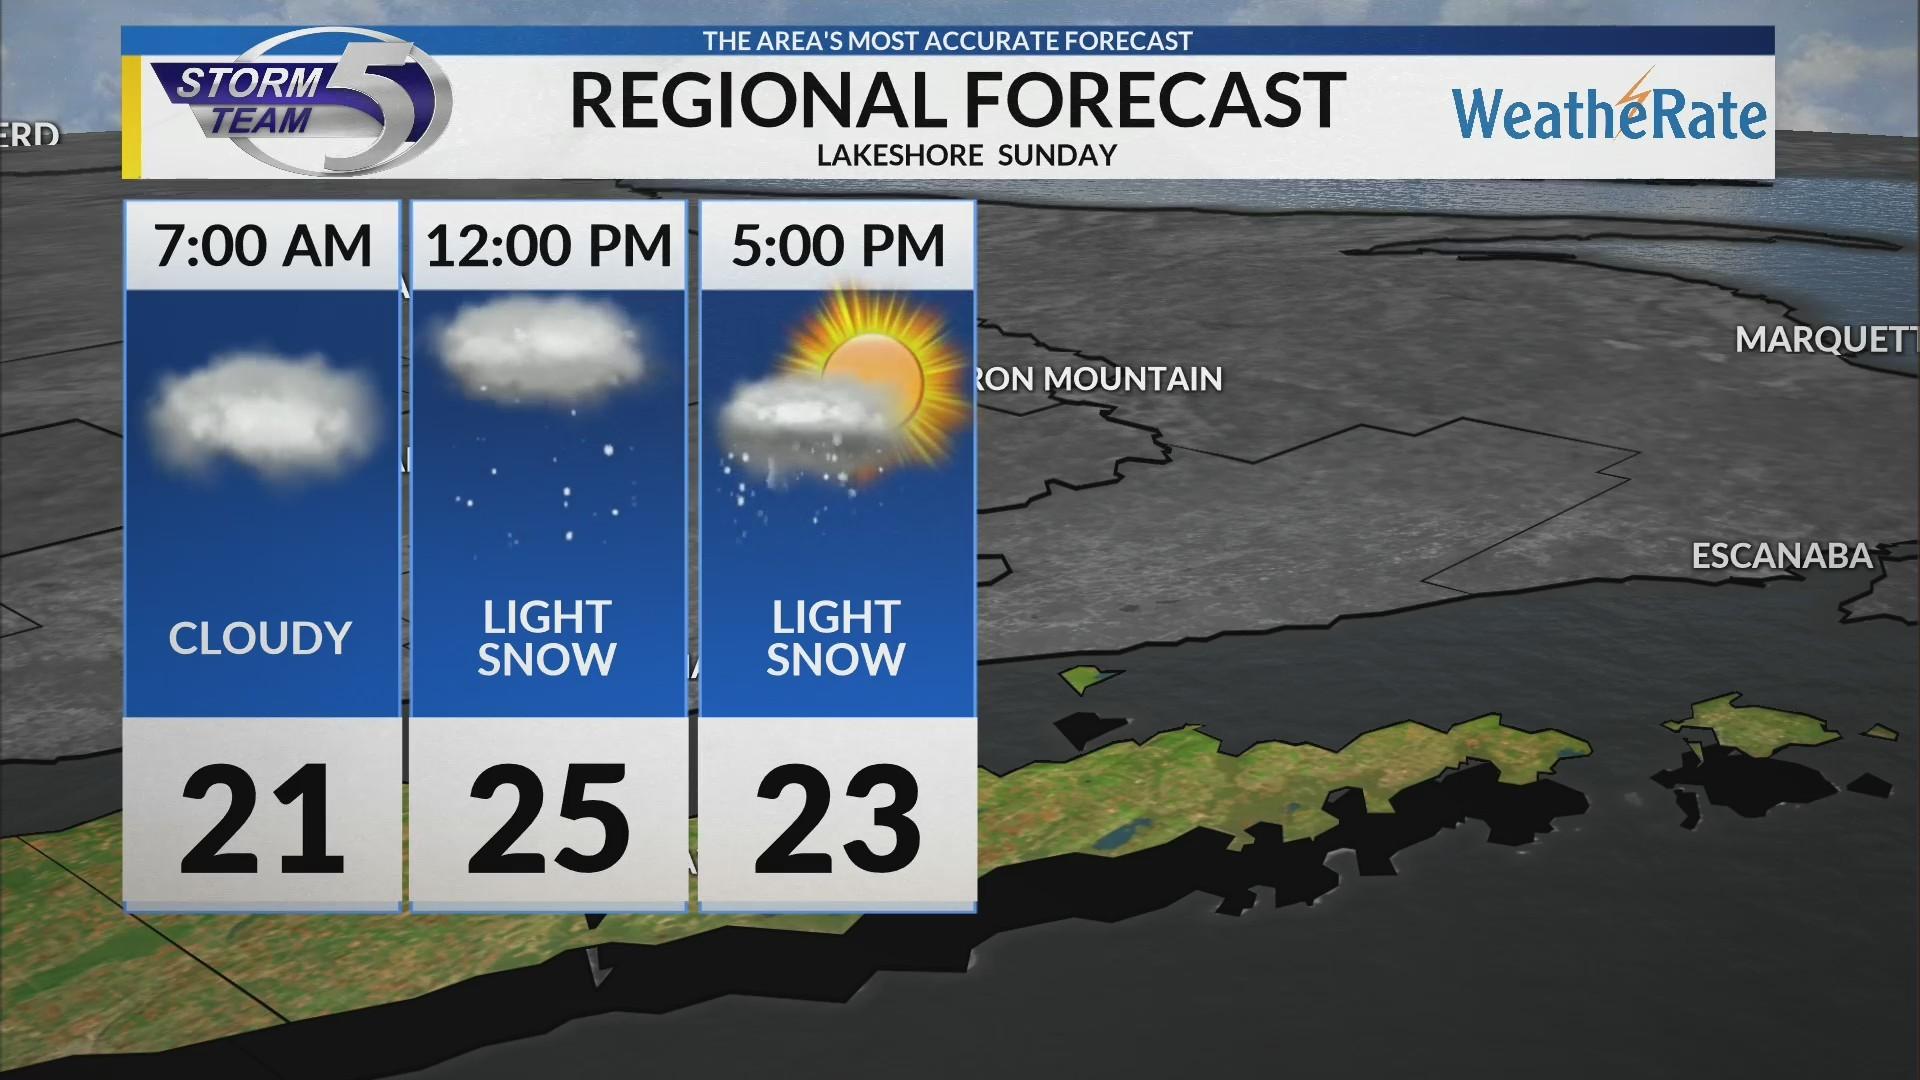 Regional Forecast: Lakeshore 2/17/2019